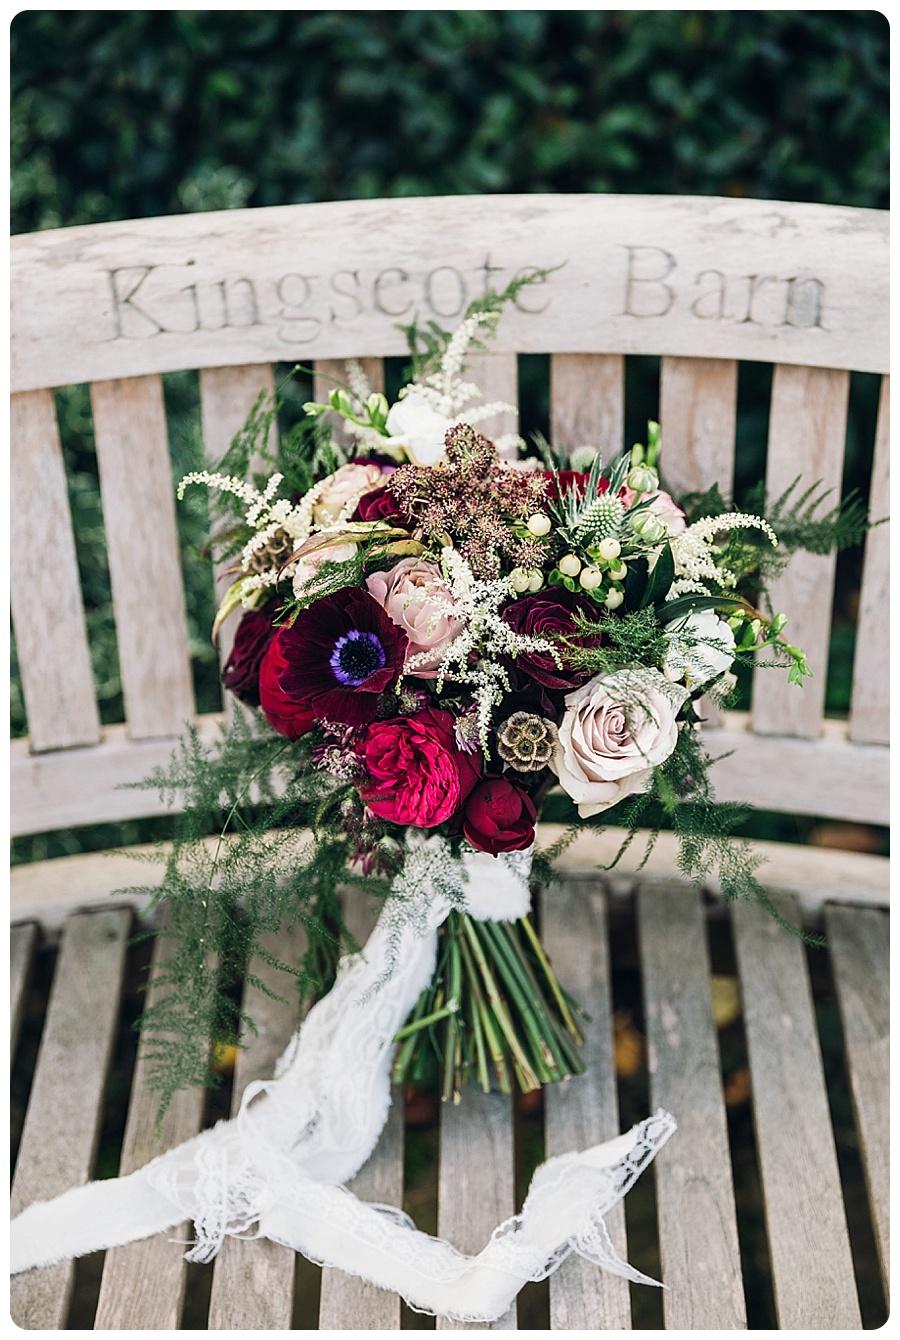 Kingscote Barn Wedding Alison & Stuart (5)